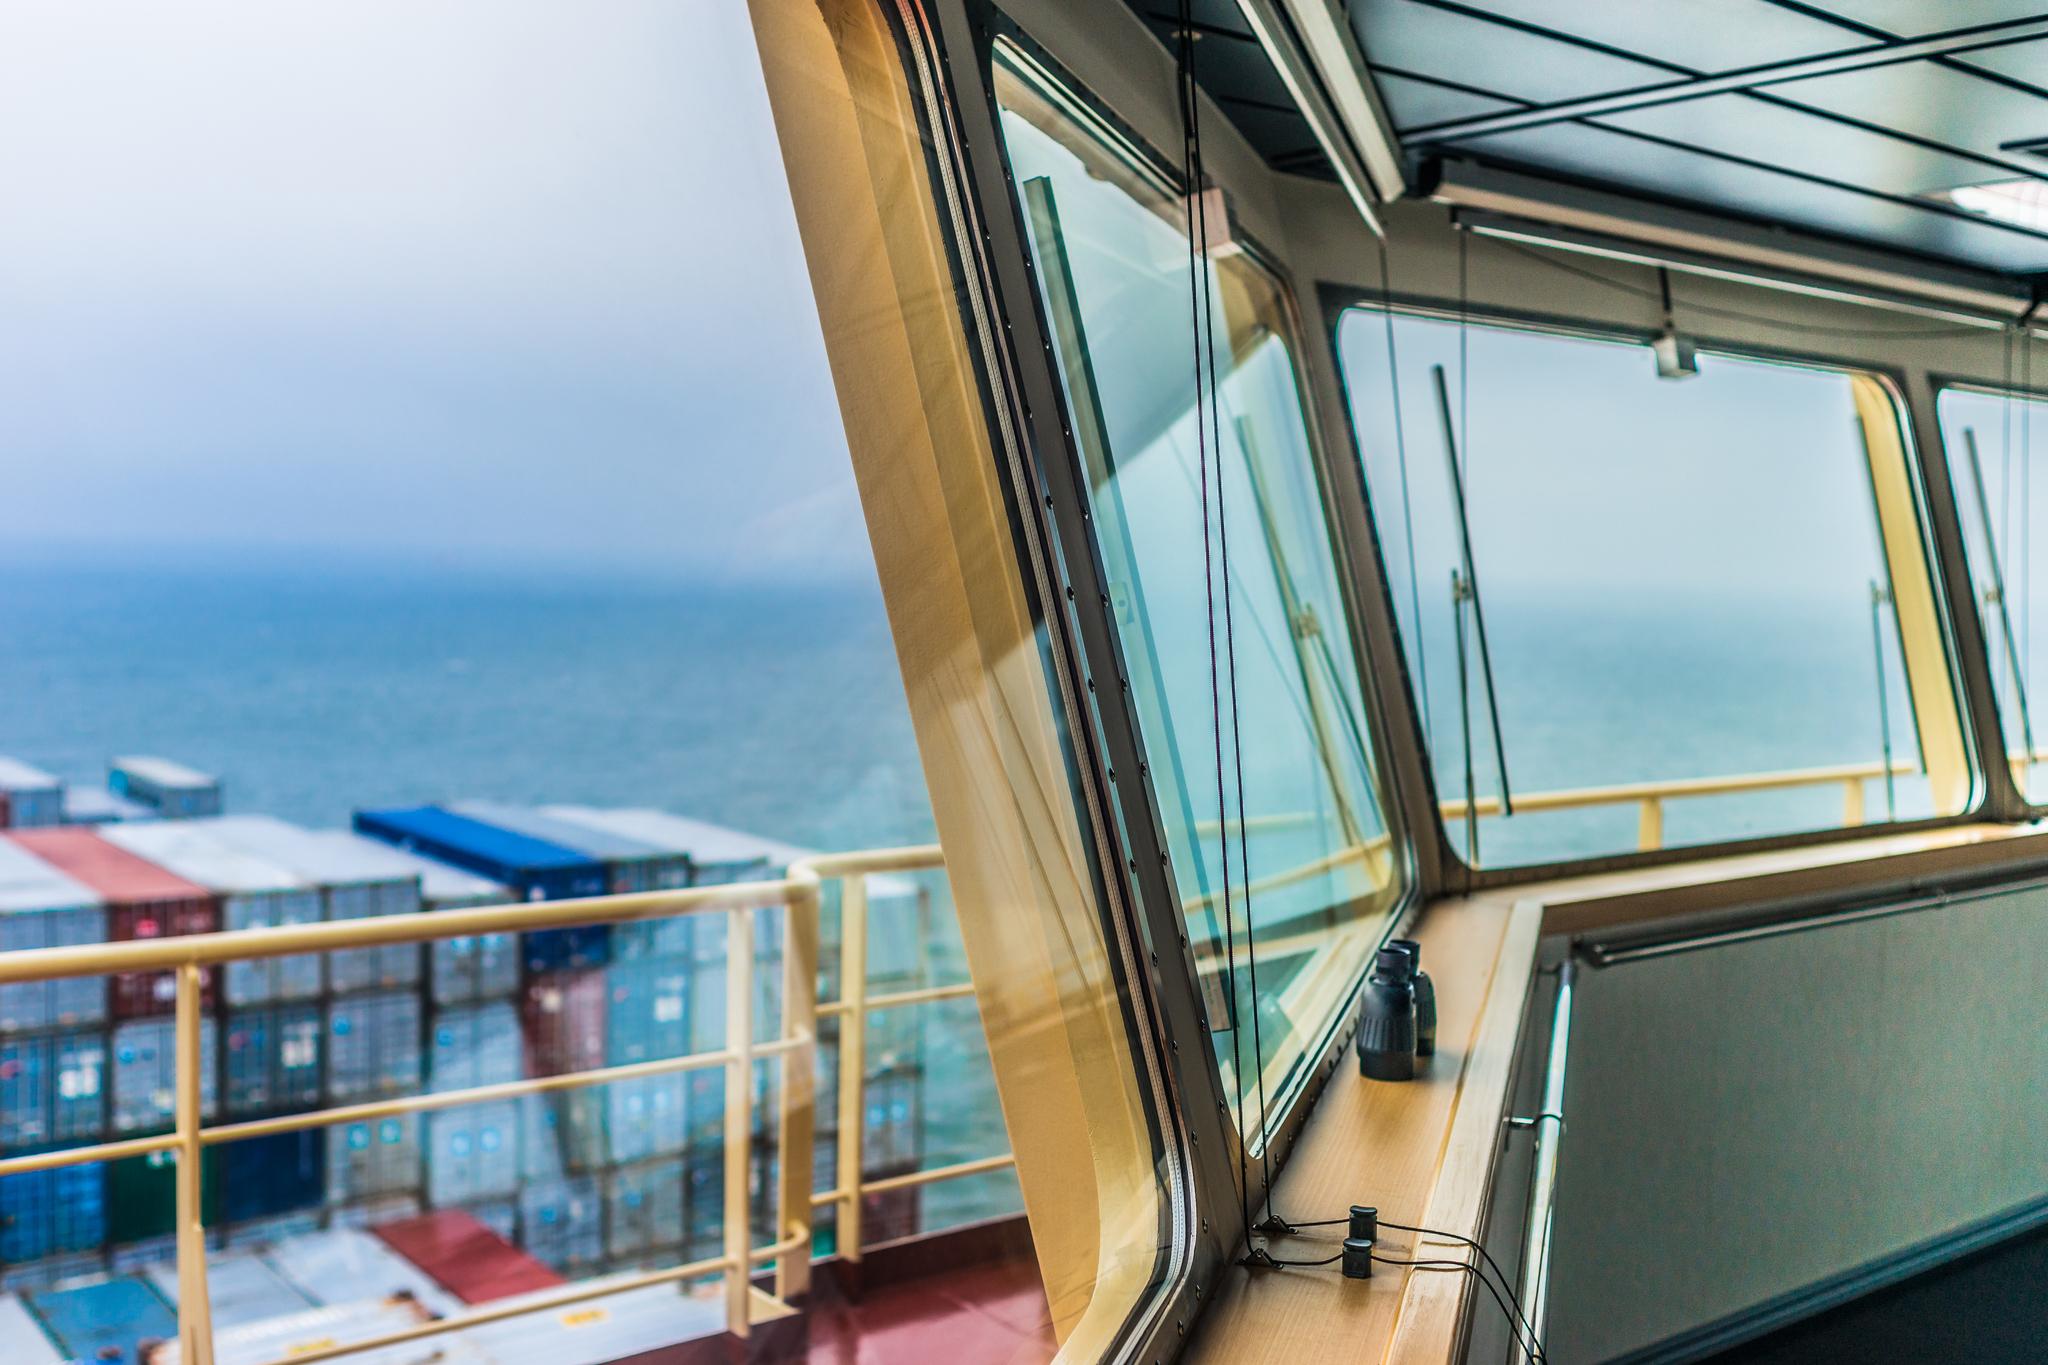 Widok z mostka Mayview Maersk (fot. Robert Urbaniak)